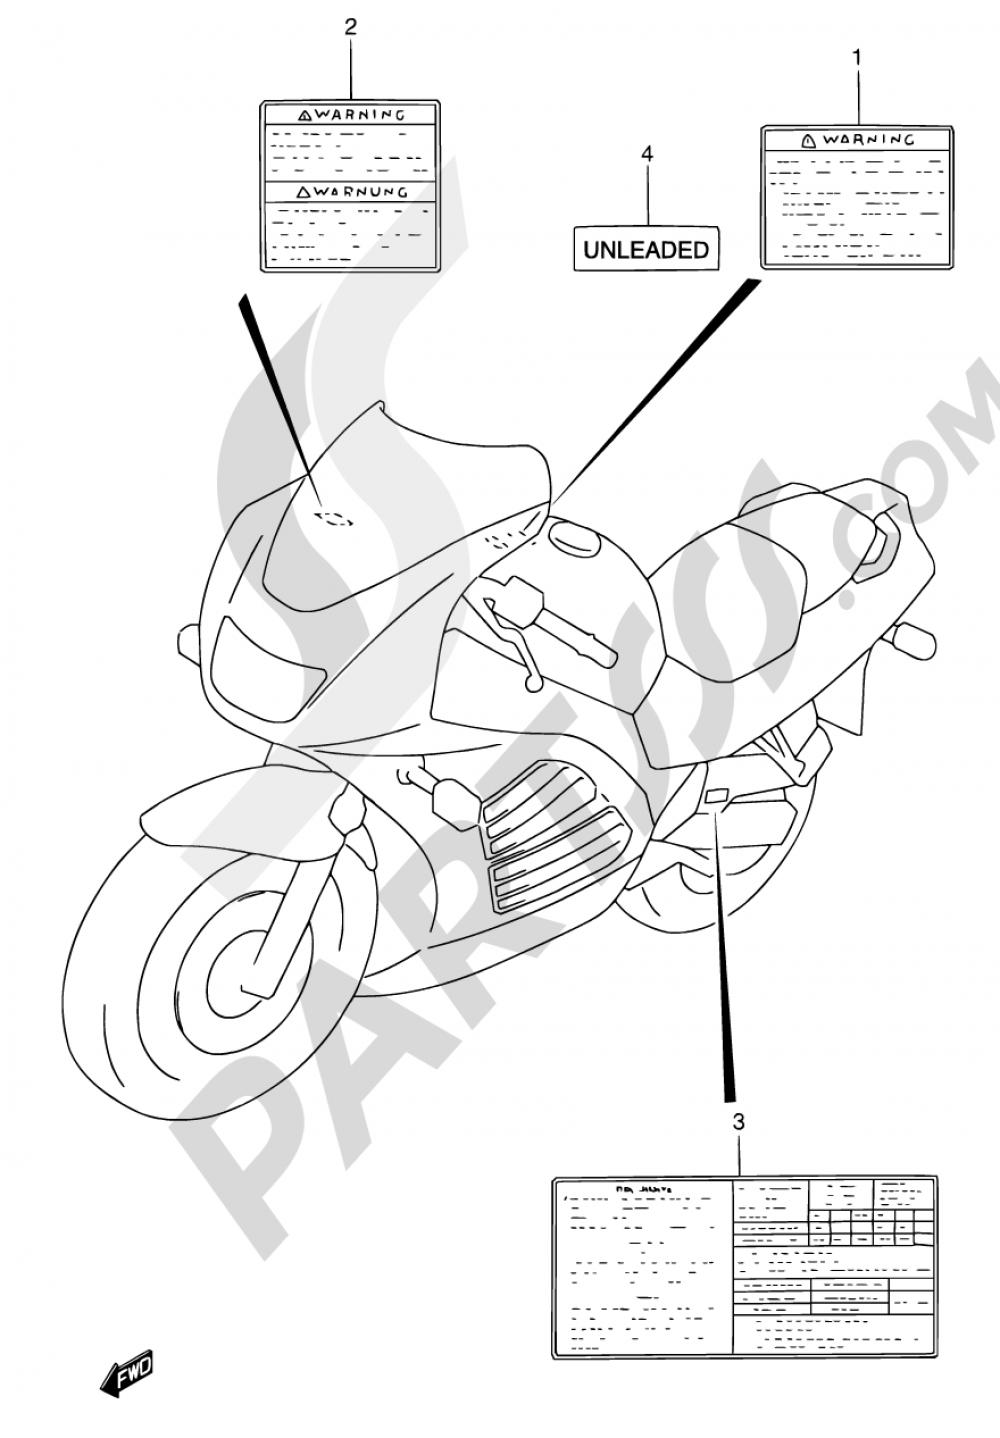 49 - LABEL (MODEL P/R/S) Suzuki RF600R 1993